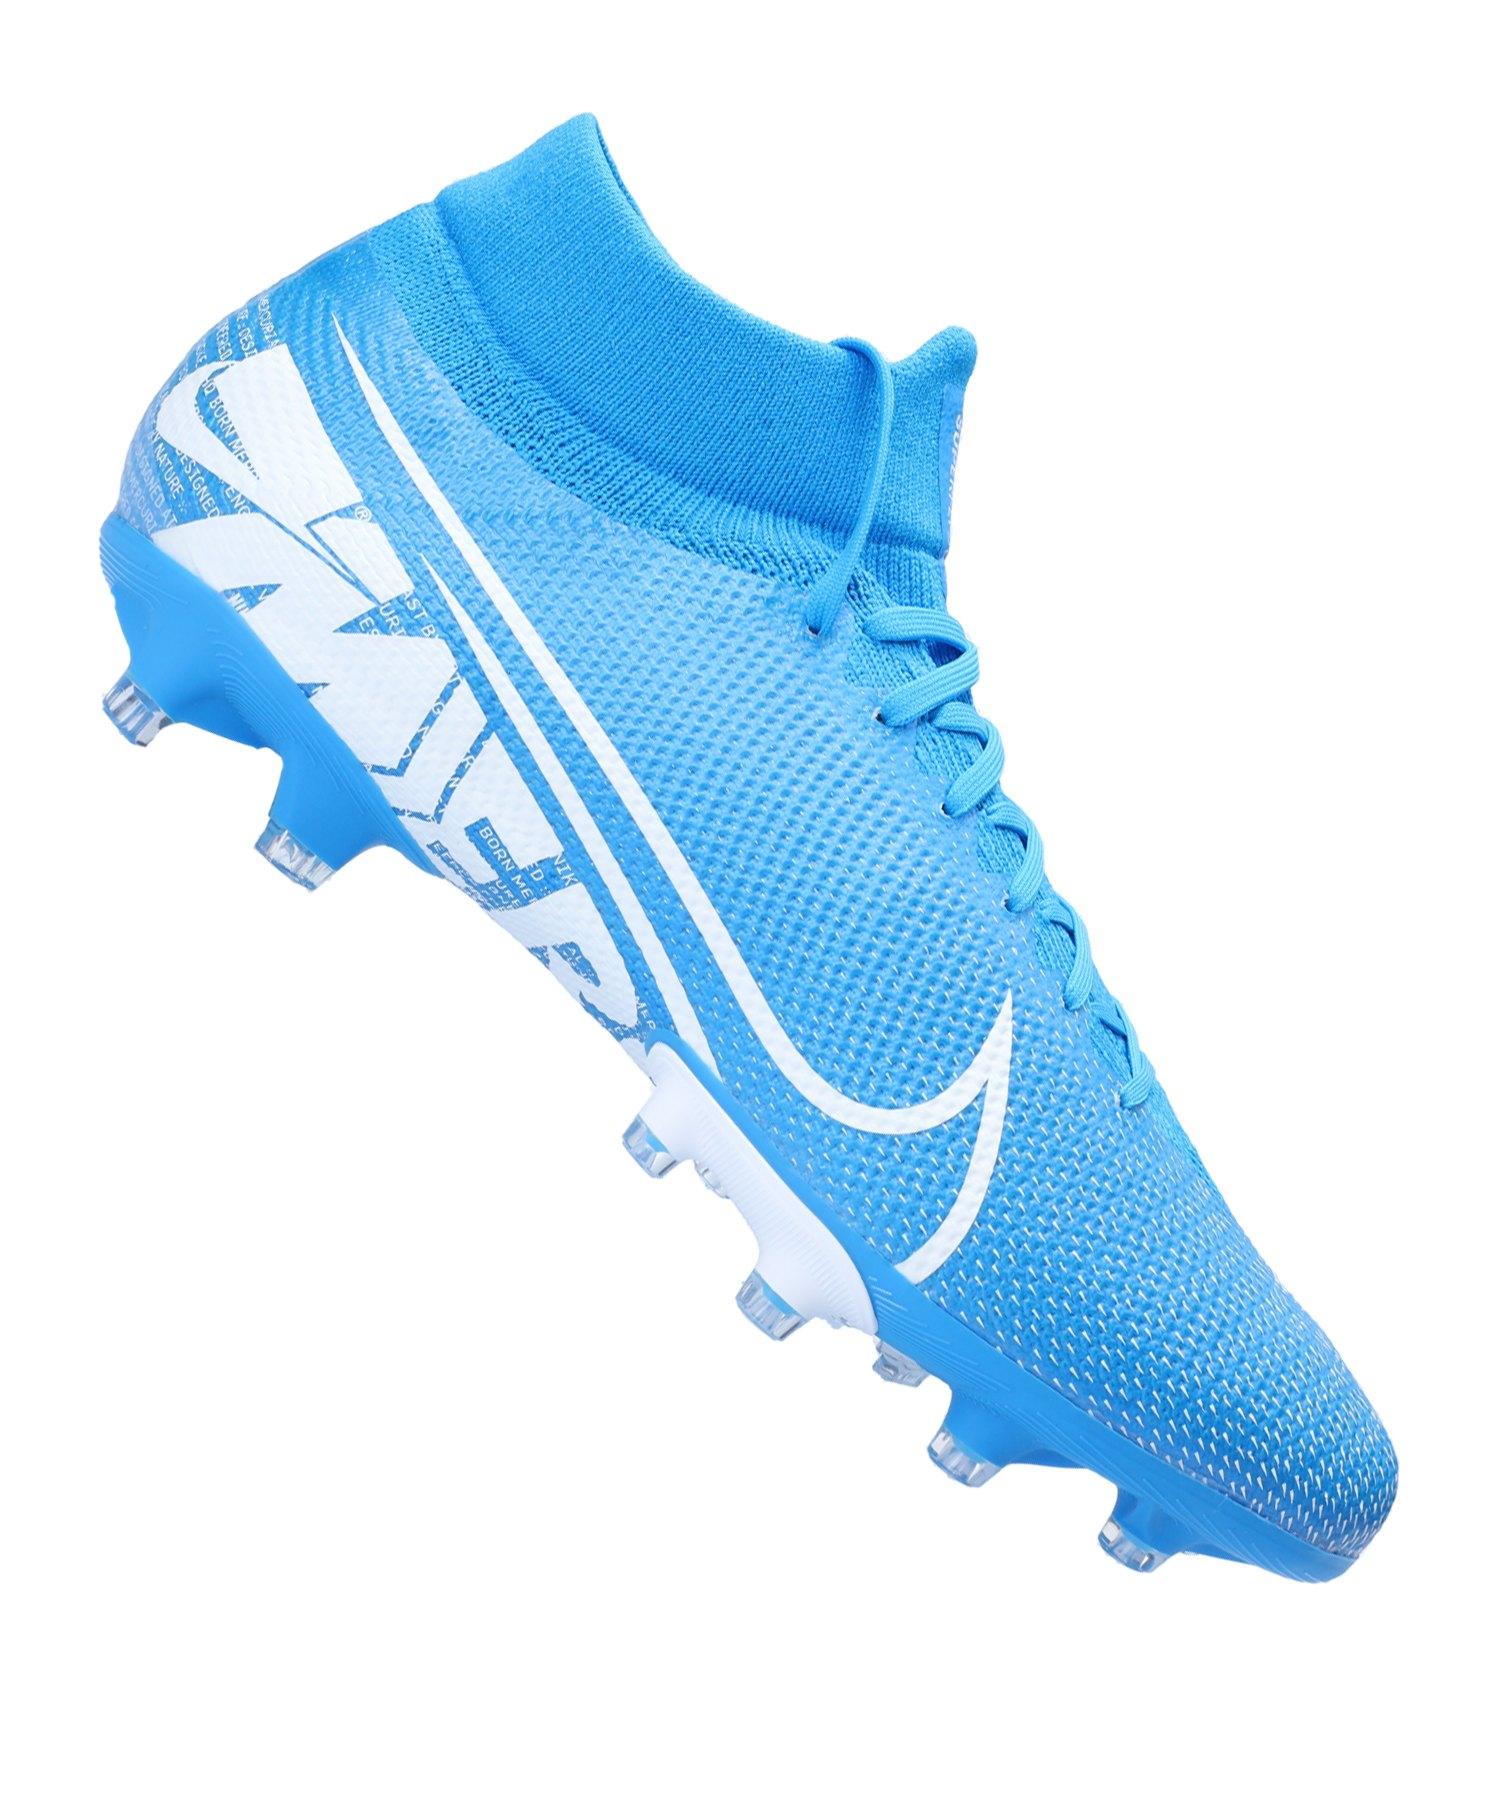 Nike Mercurial Superfly VII Pro AG-Pro Blau F414 - blau